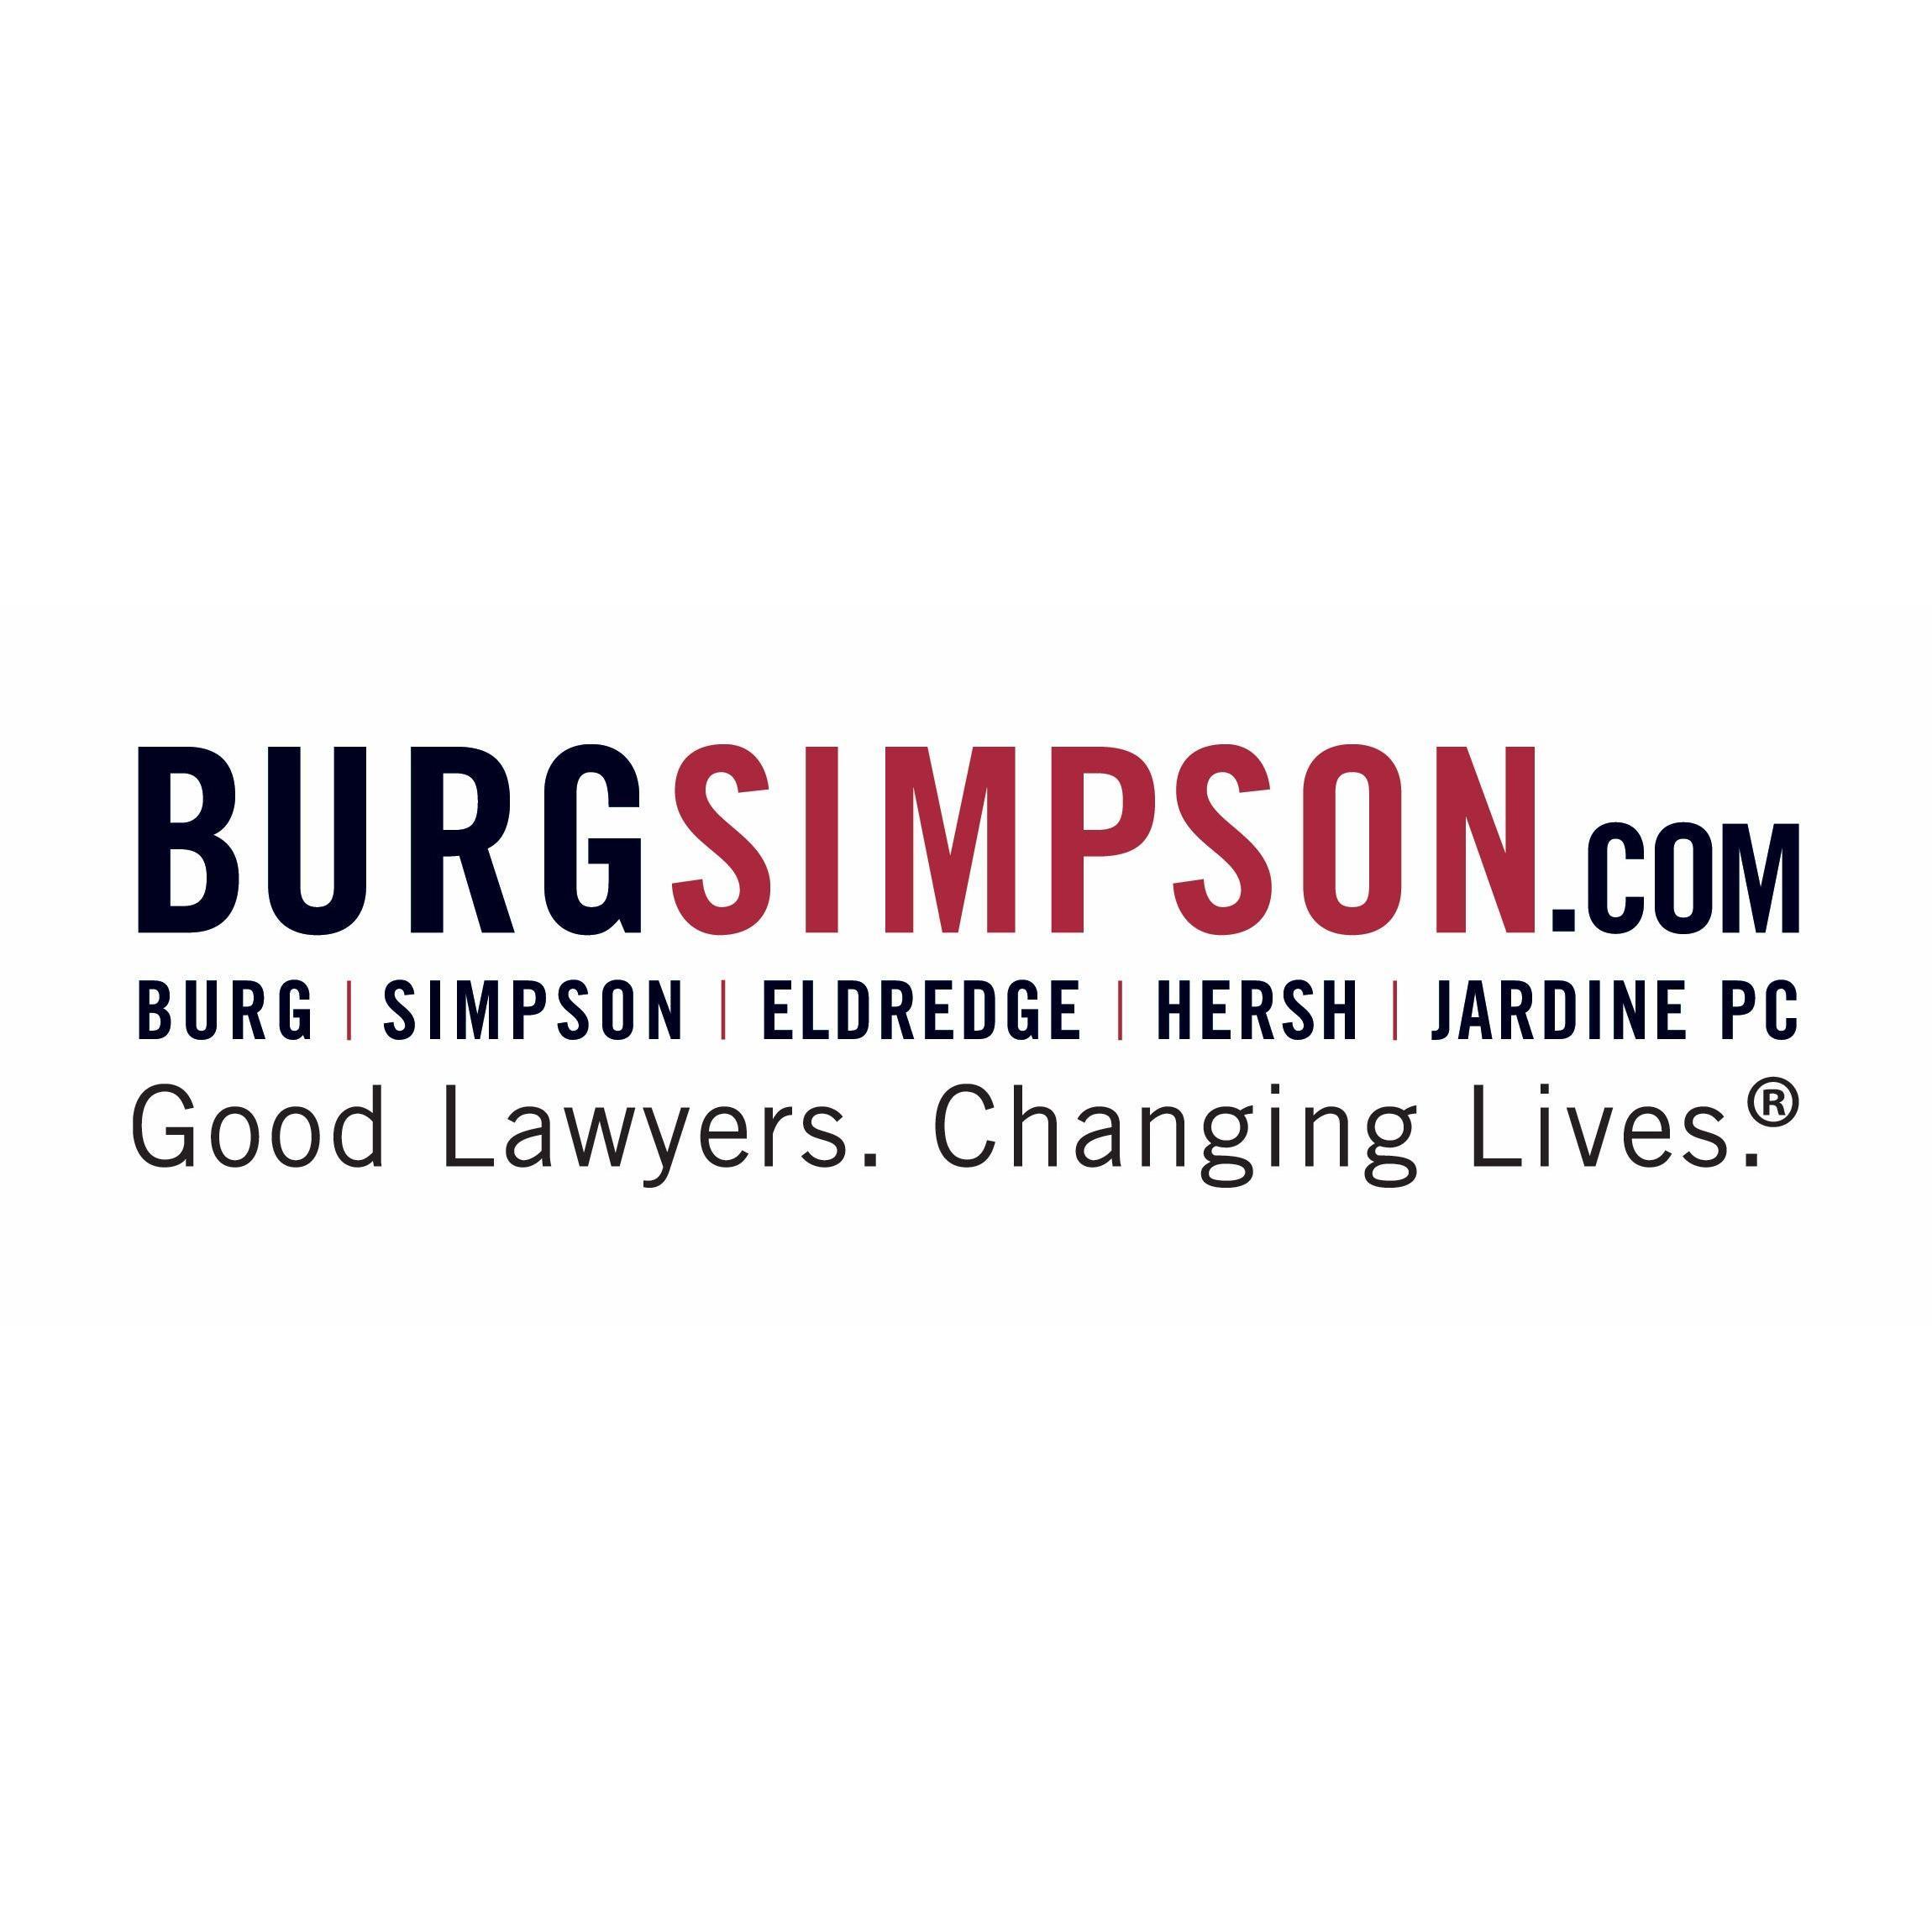 Burg Simpson Eldredge Hersh & Jardine PC - Denver